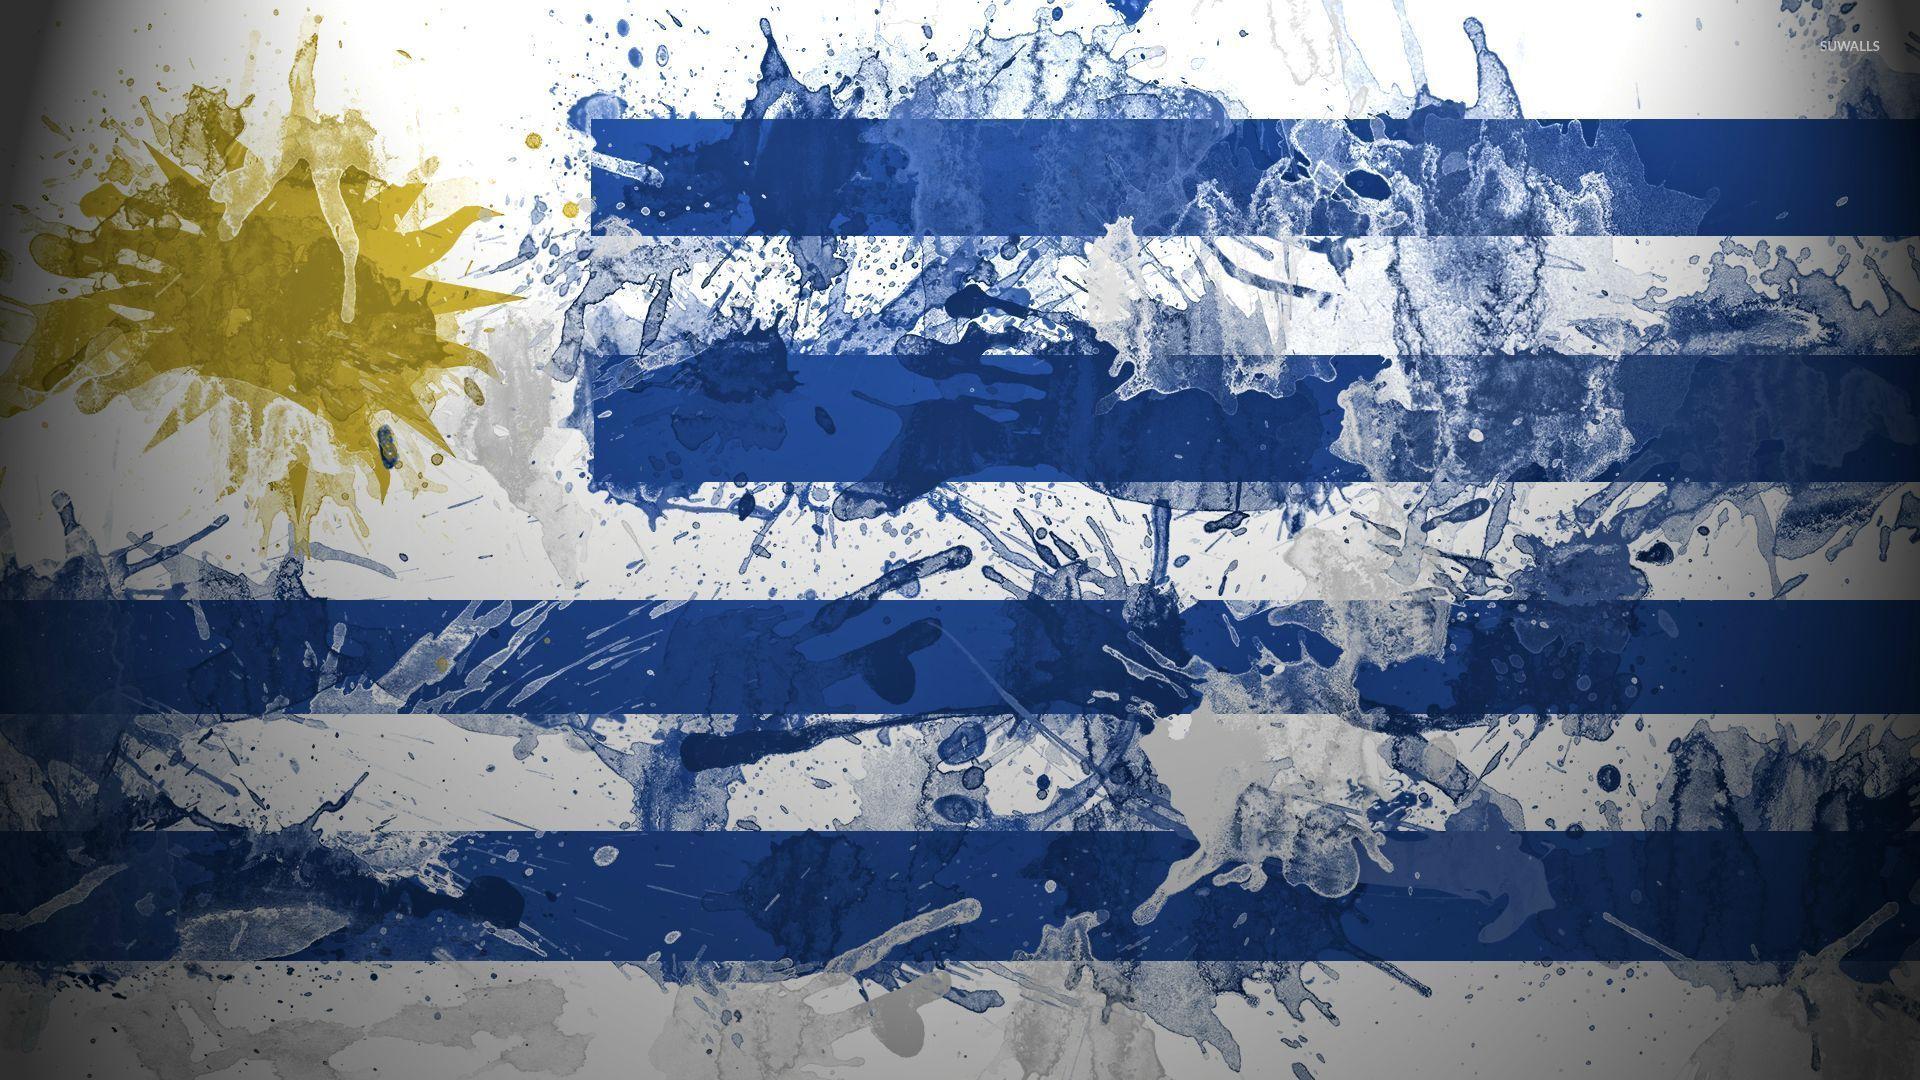 Flag Of Uruguay With Paint Drops Wallpaper Digital Art - Uruguay flag